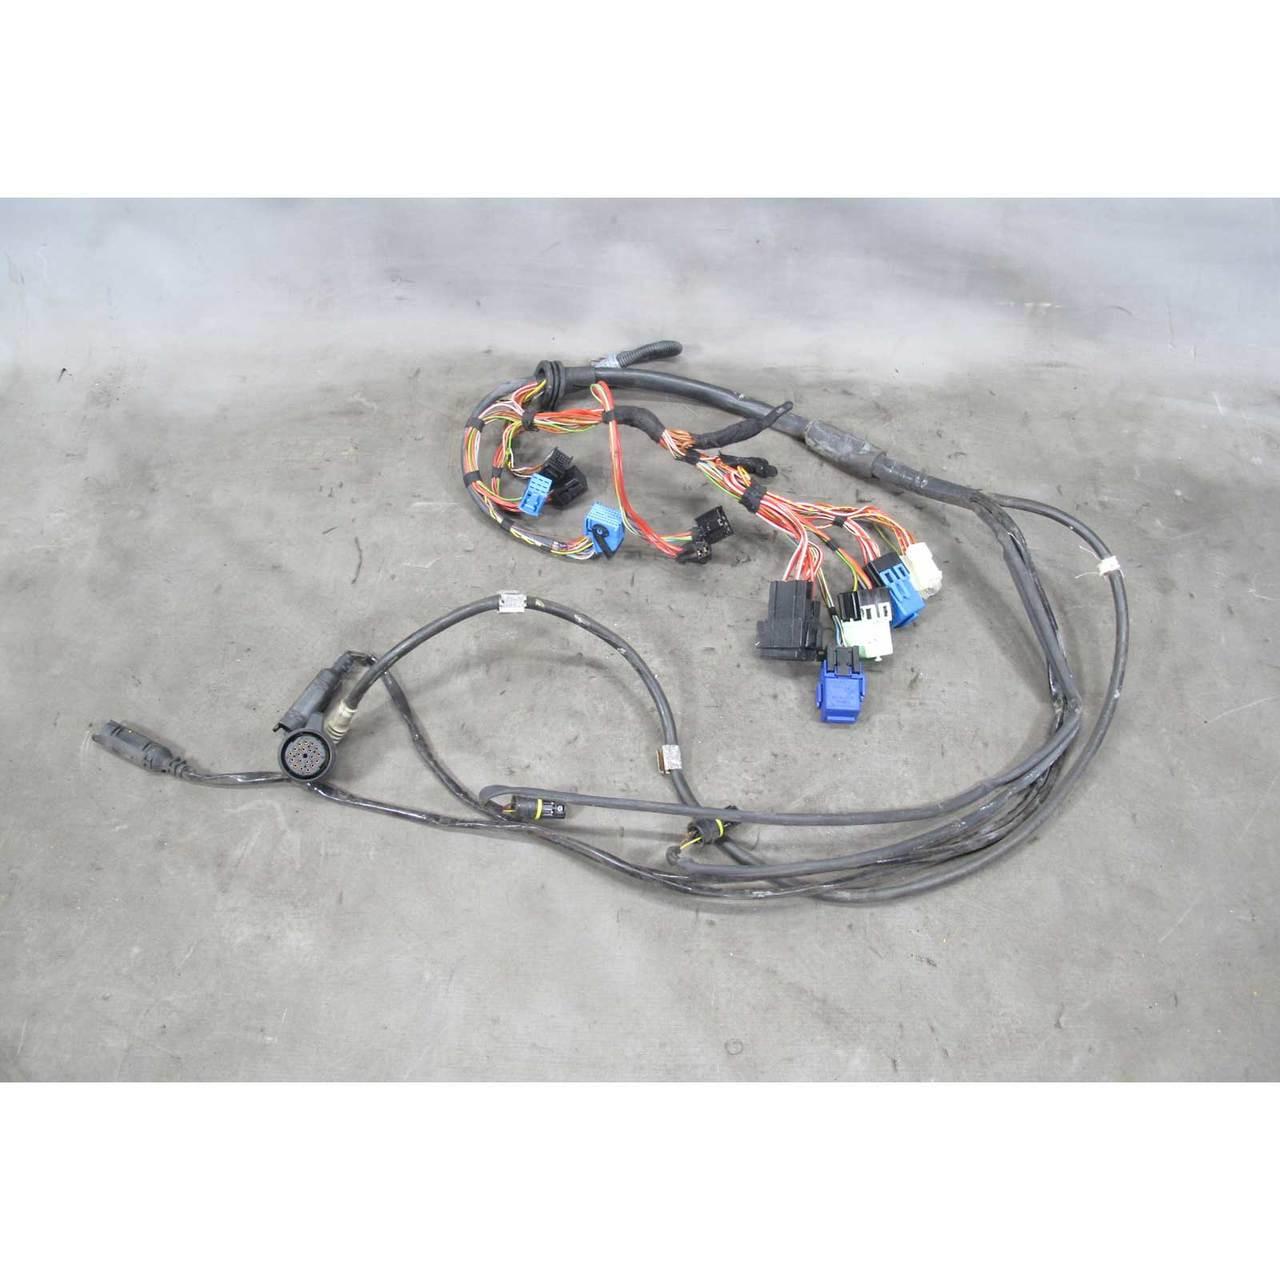 2001 2002 bmw e46 x drive m54 automatic transmission wiring harness on bmw led  [ 1280 x 1280 Pixel ]